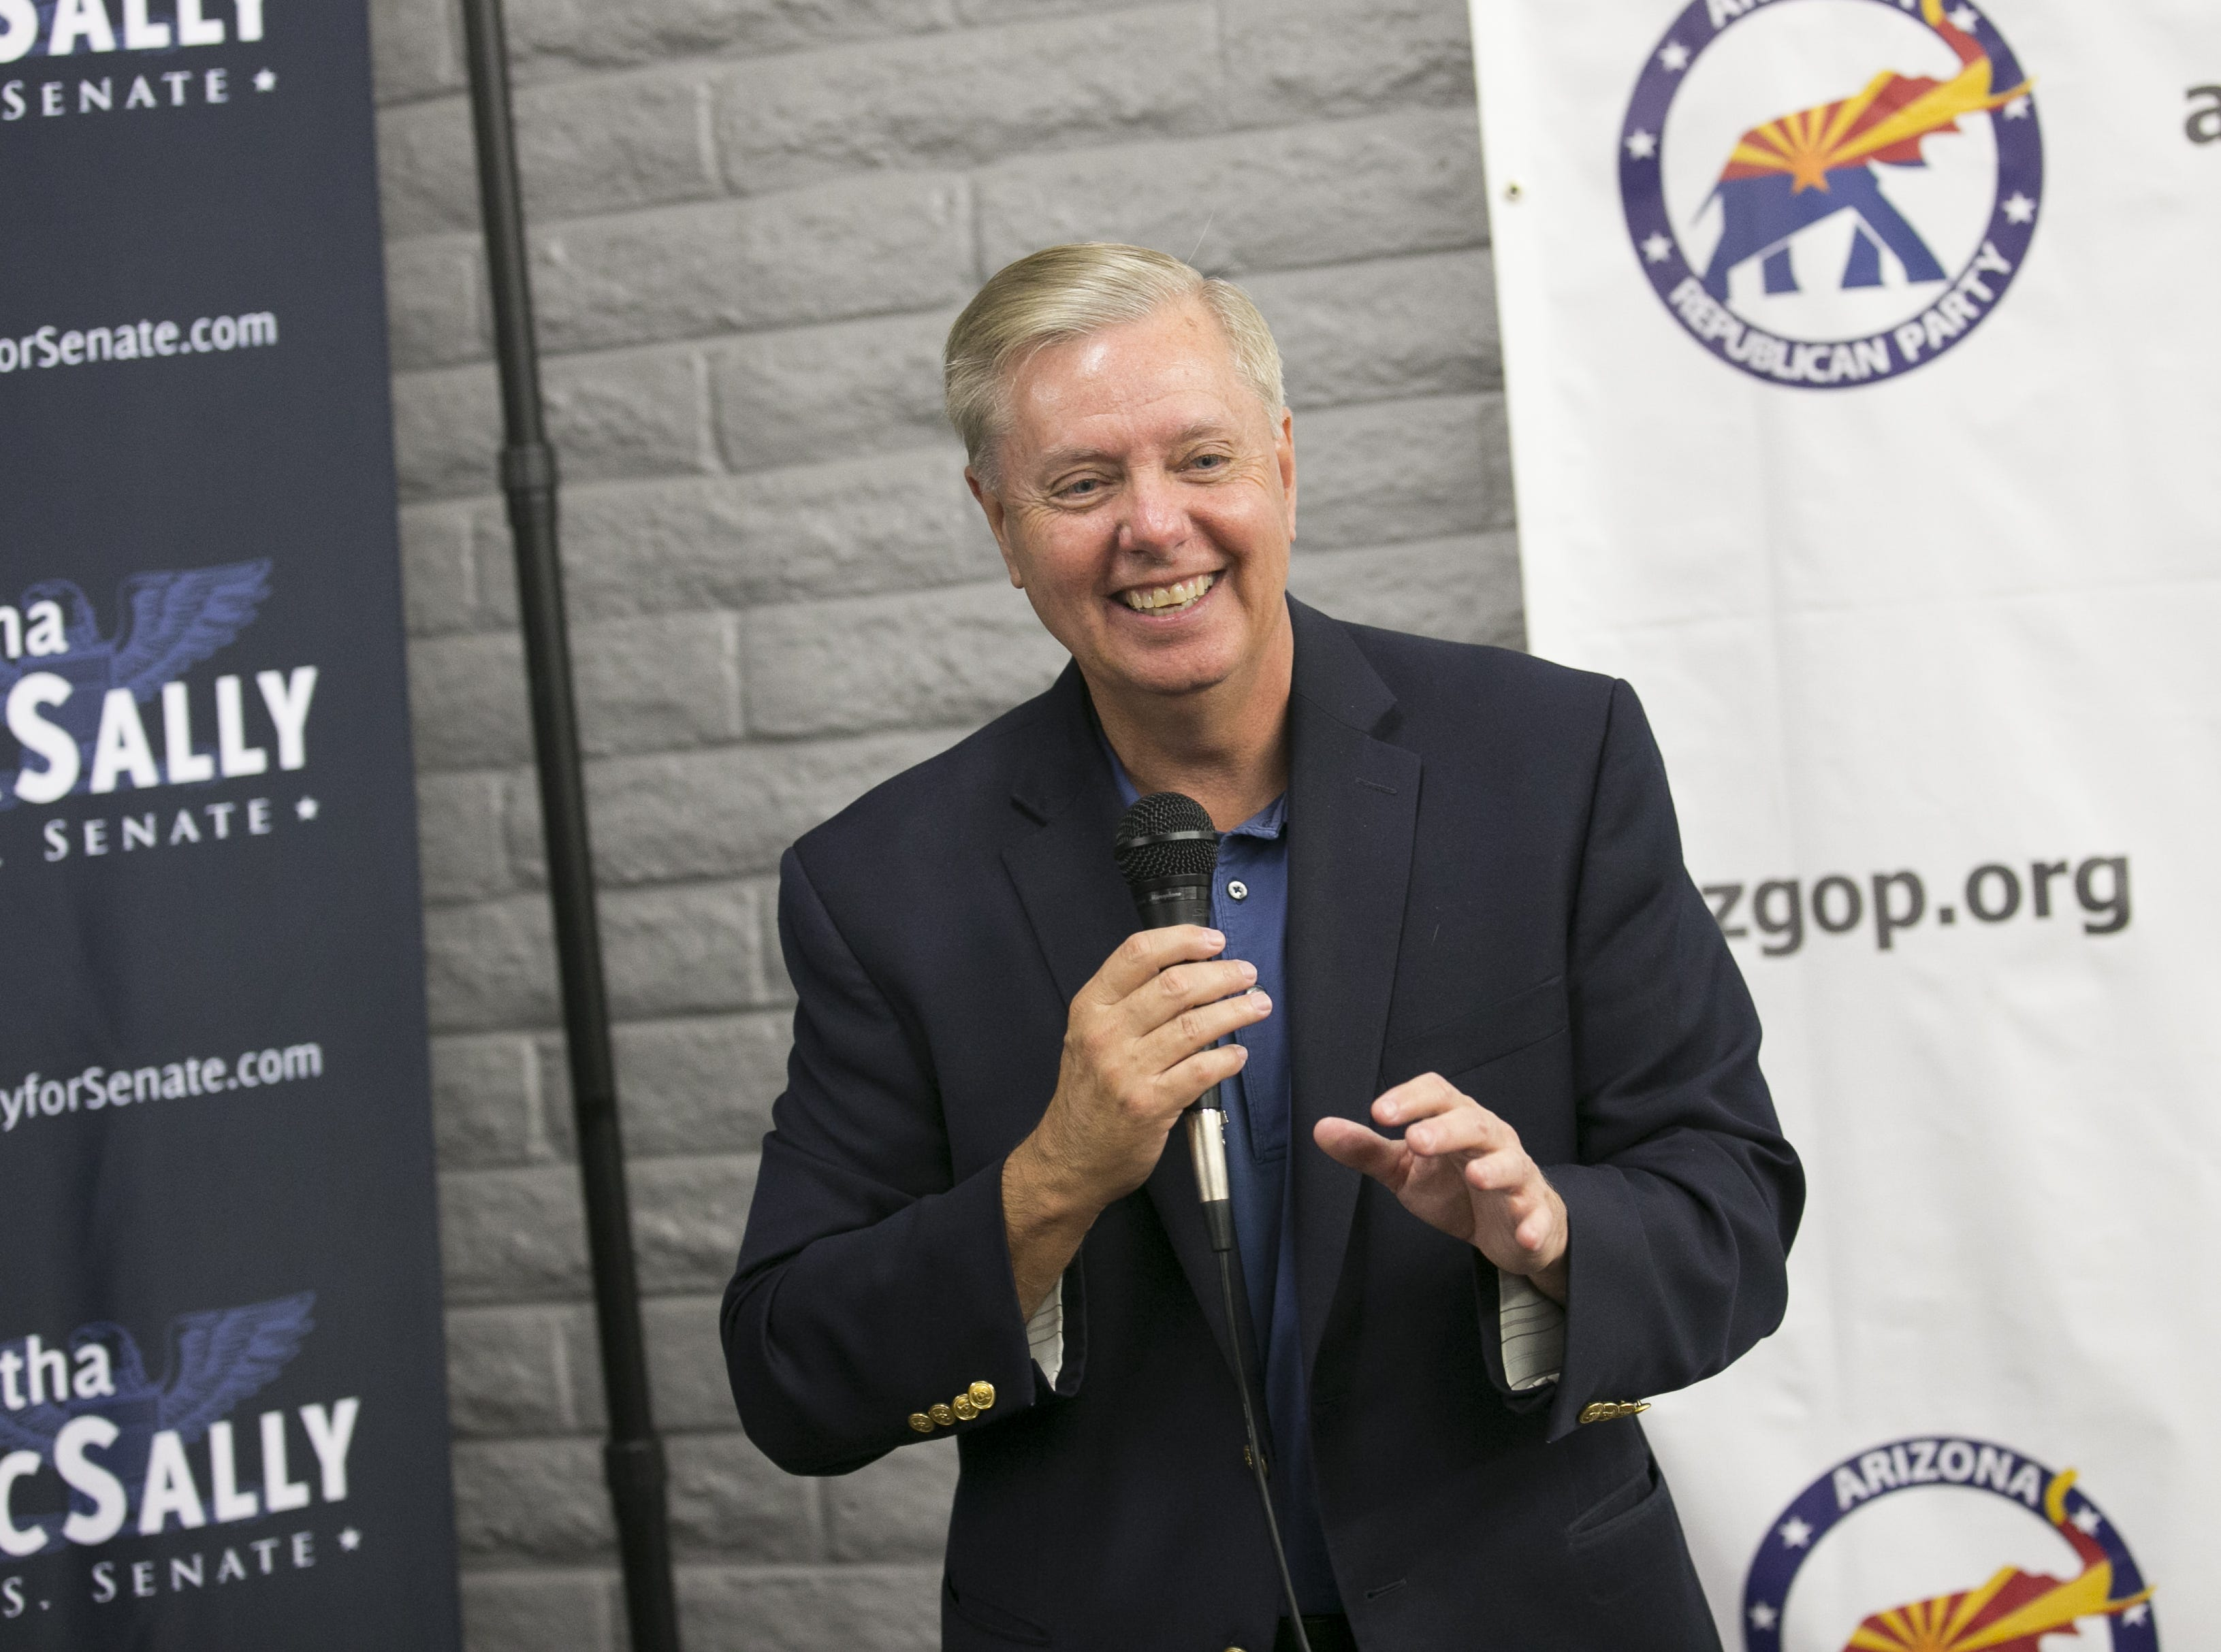 Sen. Lindsey Graham, R-S.C. speaks at the Arizona GOP headquarters in Phoenix, Ariz. on Oct. 27, 2018.